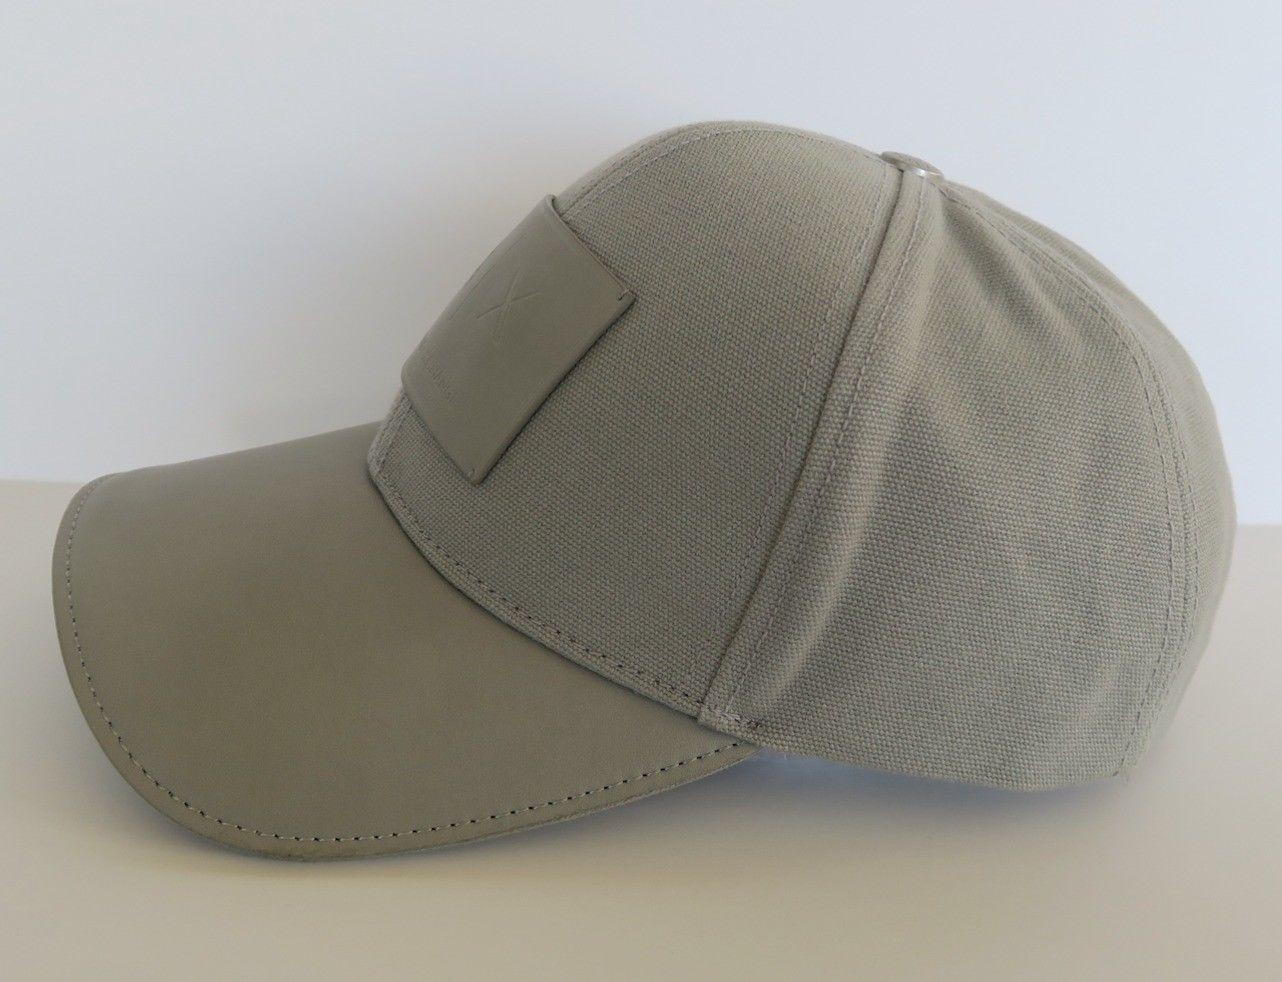 7e54b9becf2 Armani Exchange AIX Logo Patch Trucker Full Back Hat Cap in Allow Grey BNWT